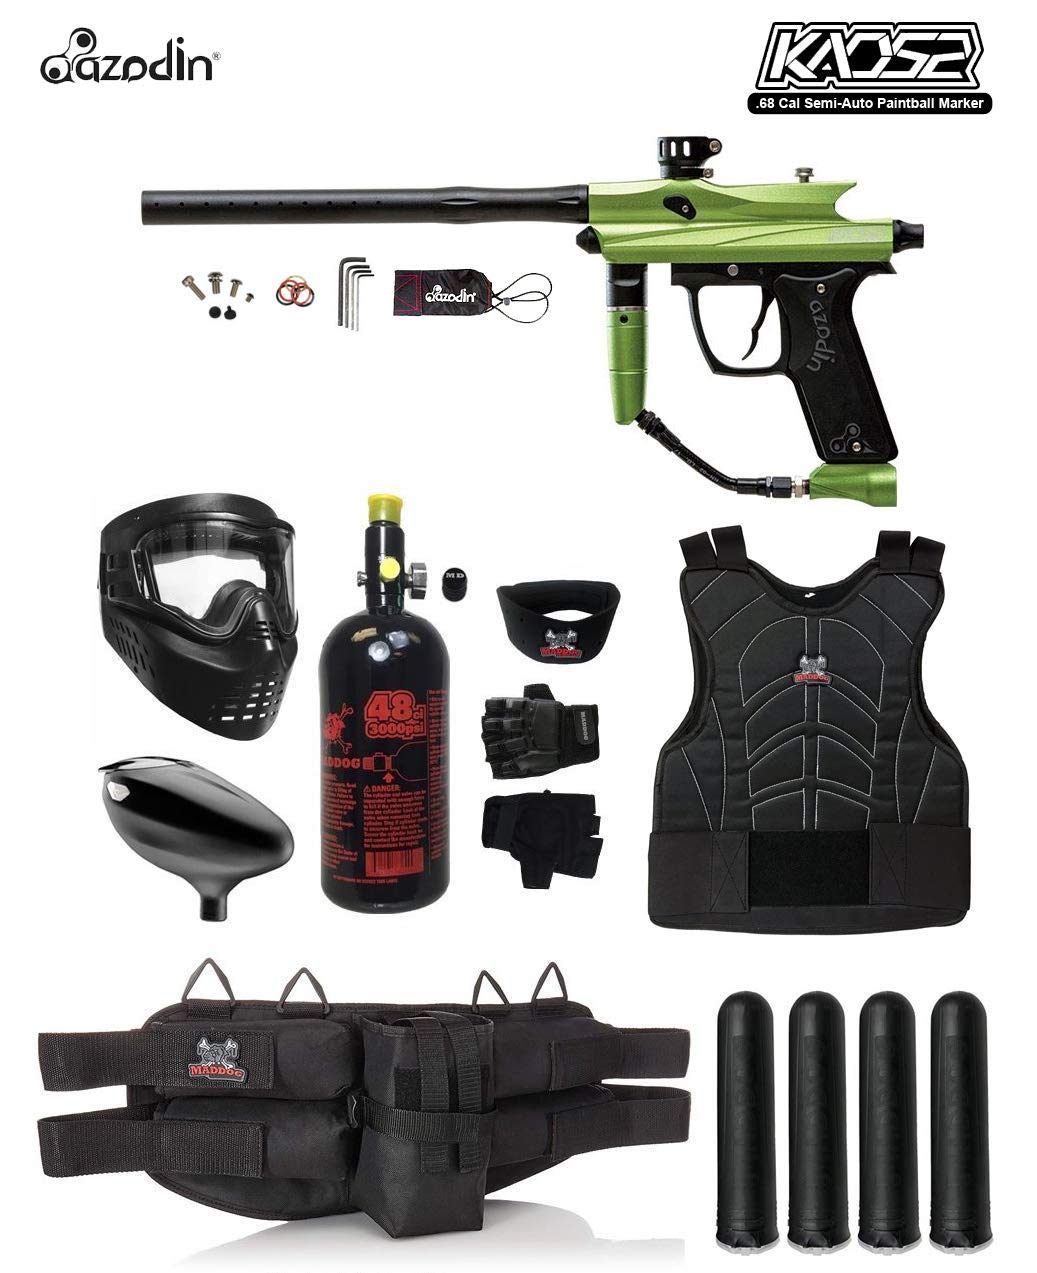 MAddog Azodin KAOS 2 Starter Protective HPA Paintball Gun Package - Green/Black